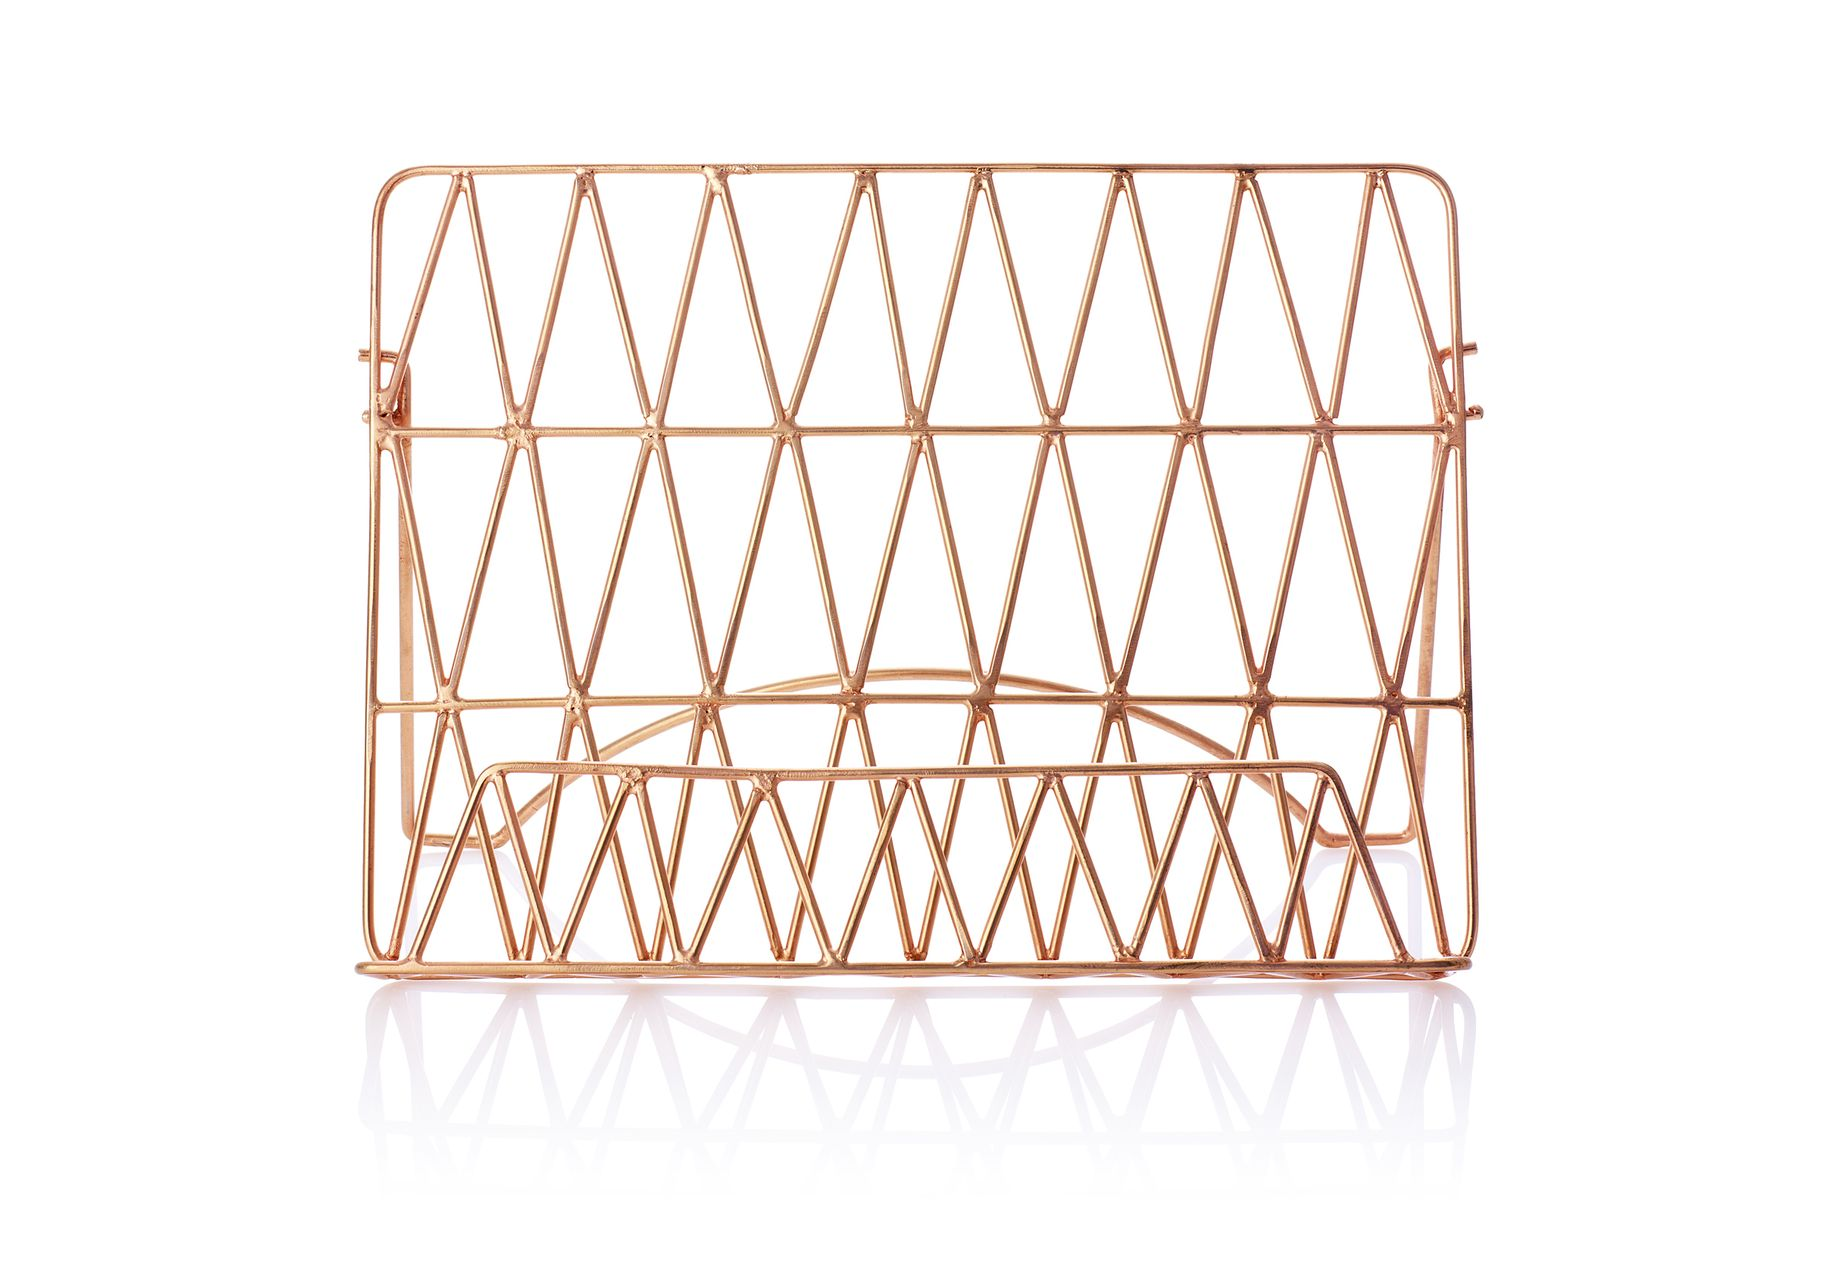 NW3 Interiors - Oliver Bonas Copper Wire Recipe Stand